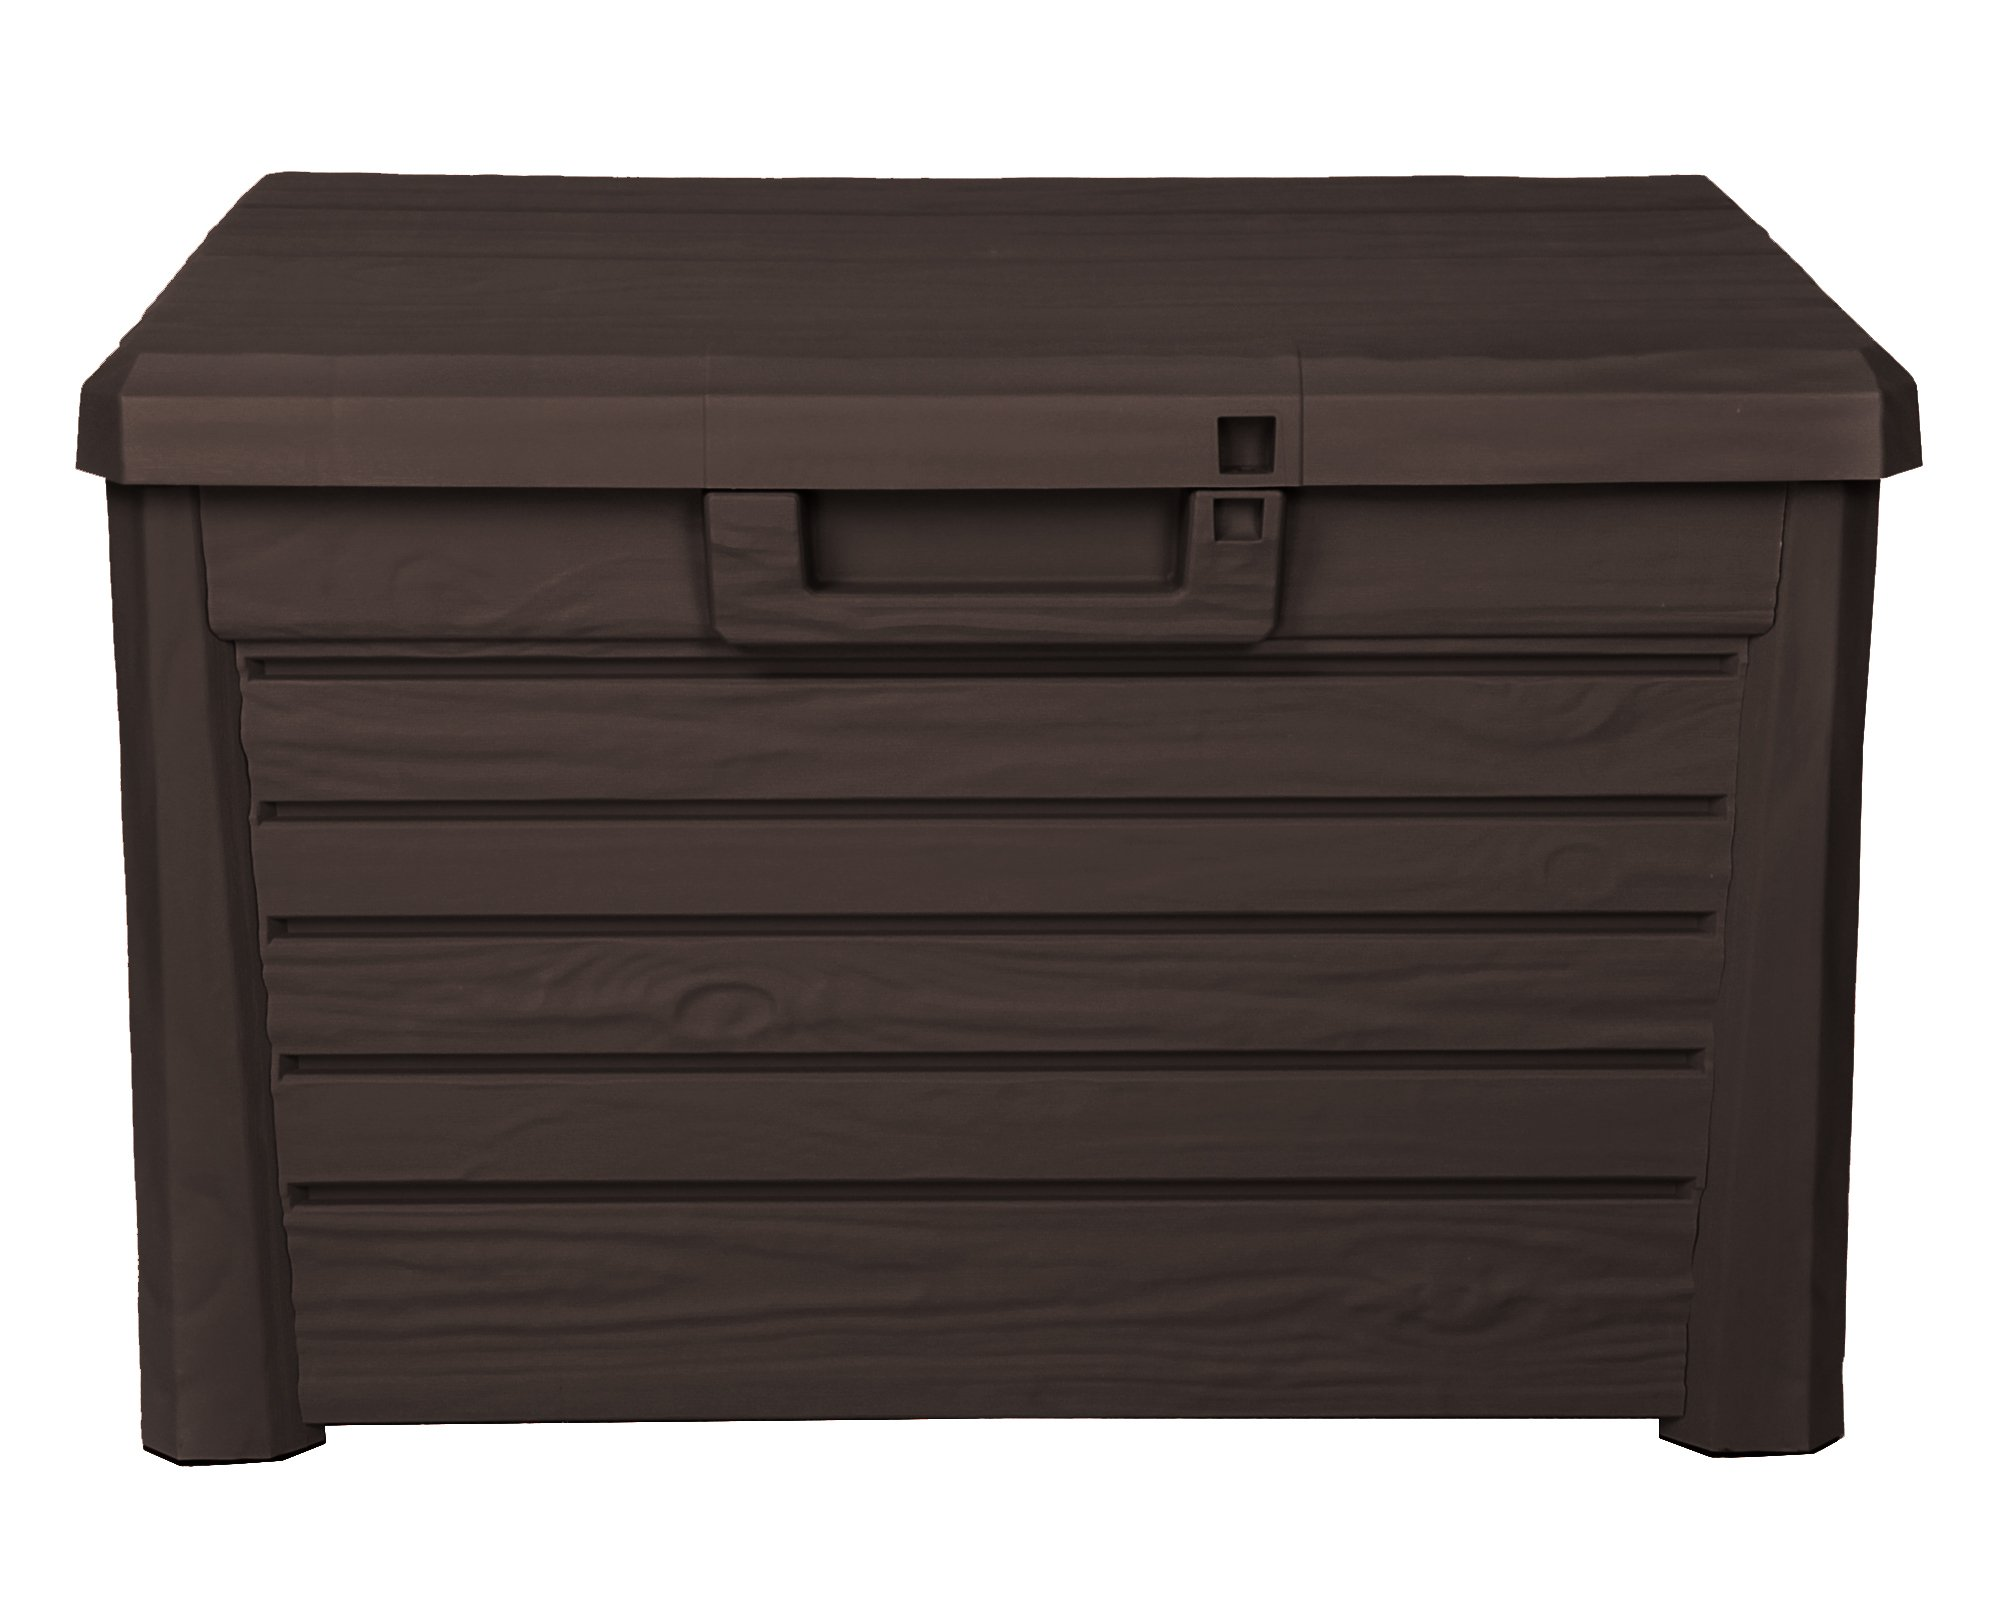 Toomax Kissenbox #Z158 braun 120 Liter Inhalt Holz Optik – mit Sitzfläche 200 kg Tragkraft – abschließbar